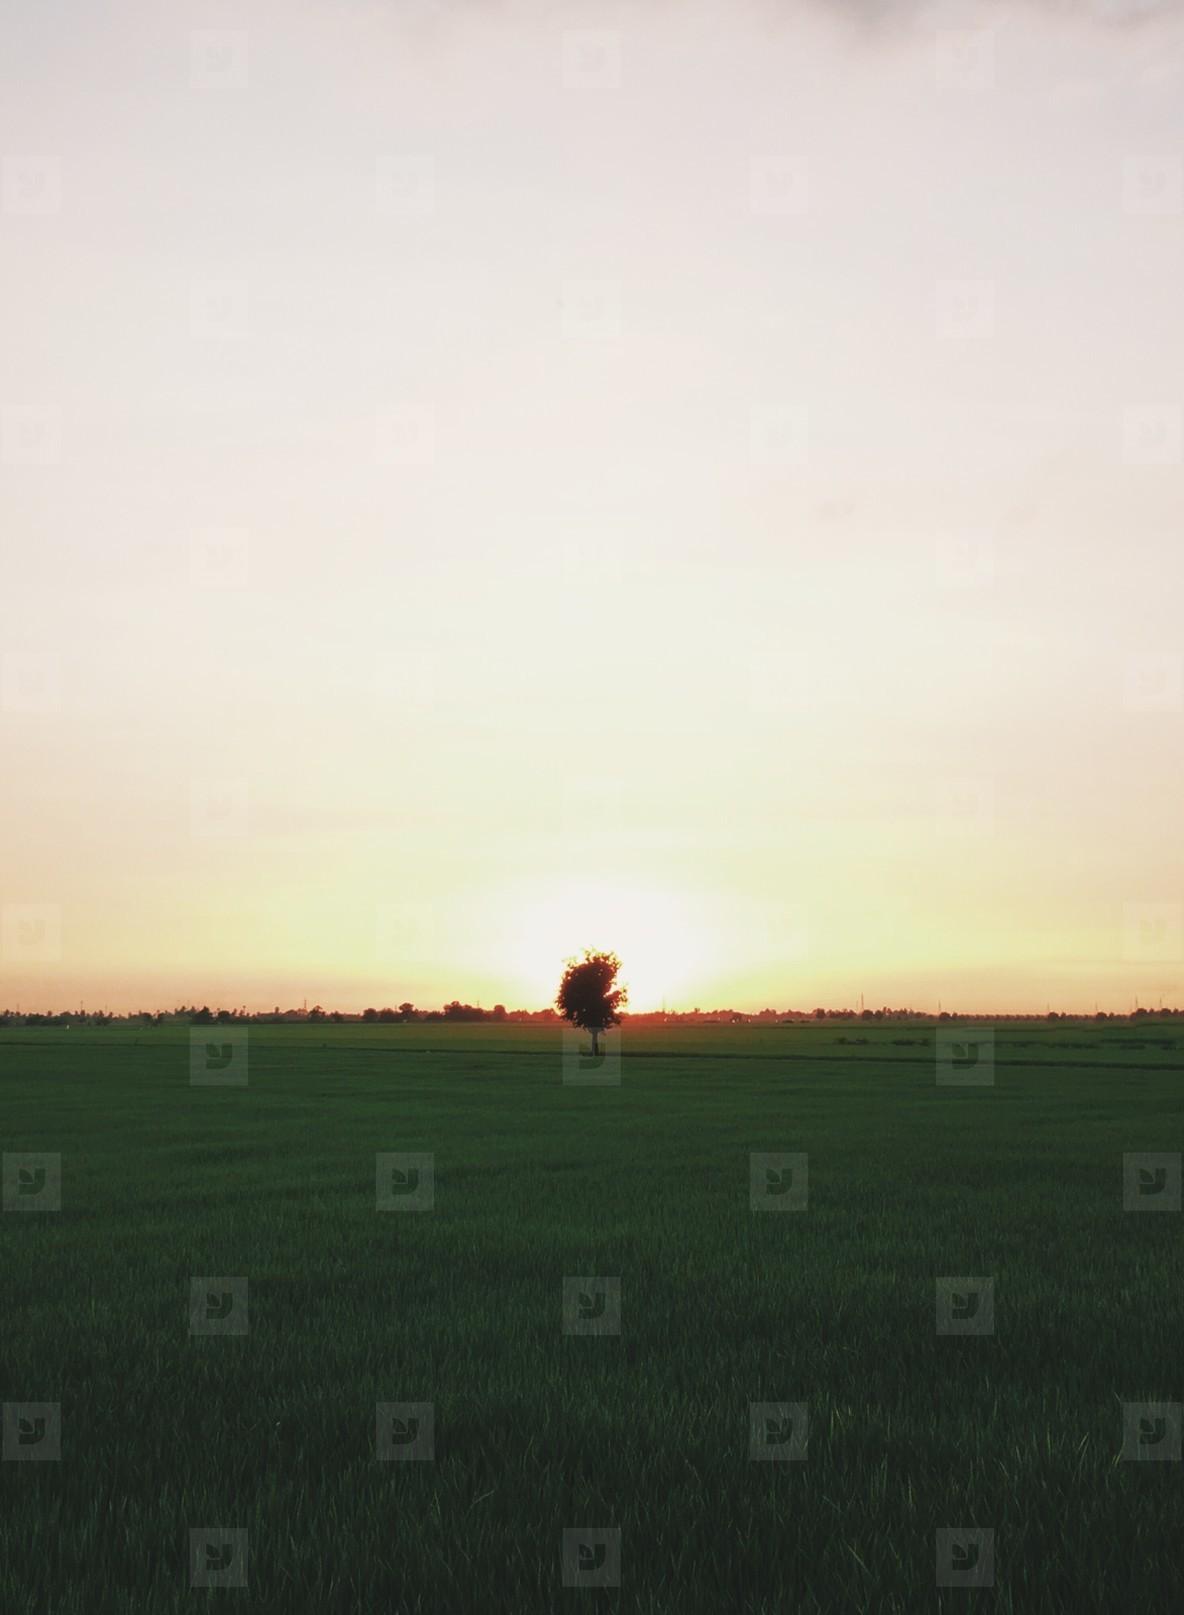 Alone tree in farm rice